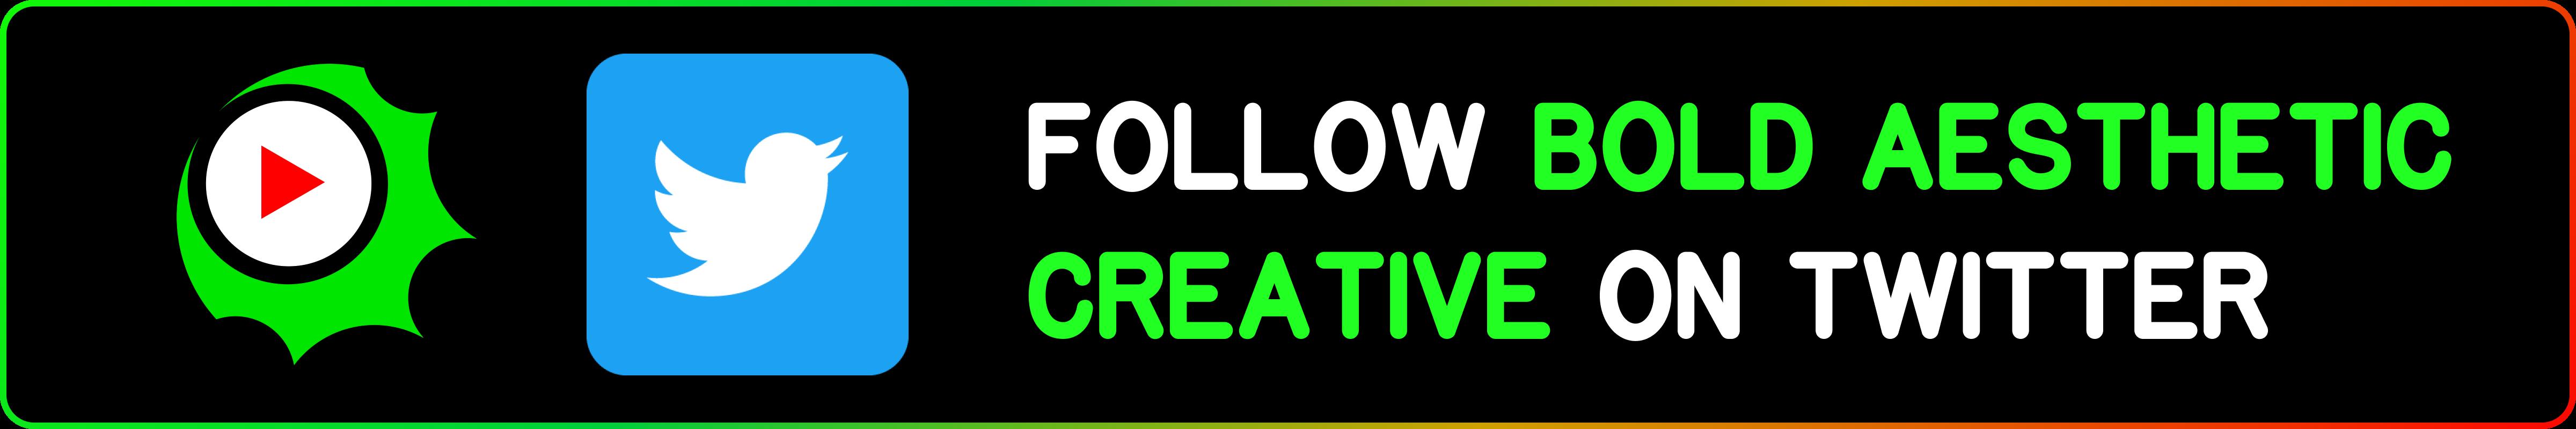 Bold Aesthetic Creative Twitter